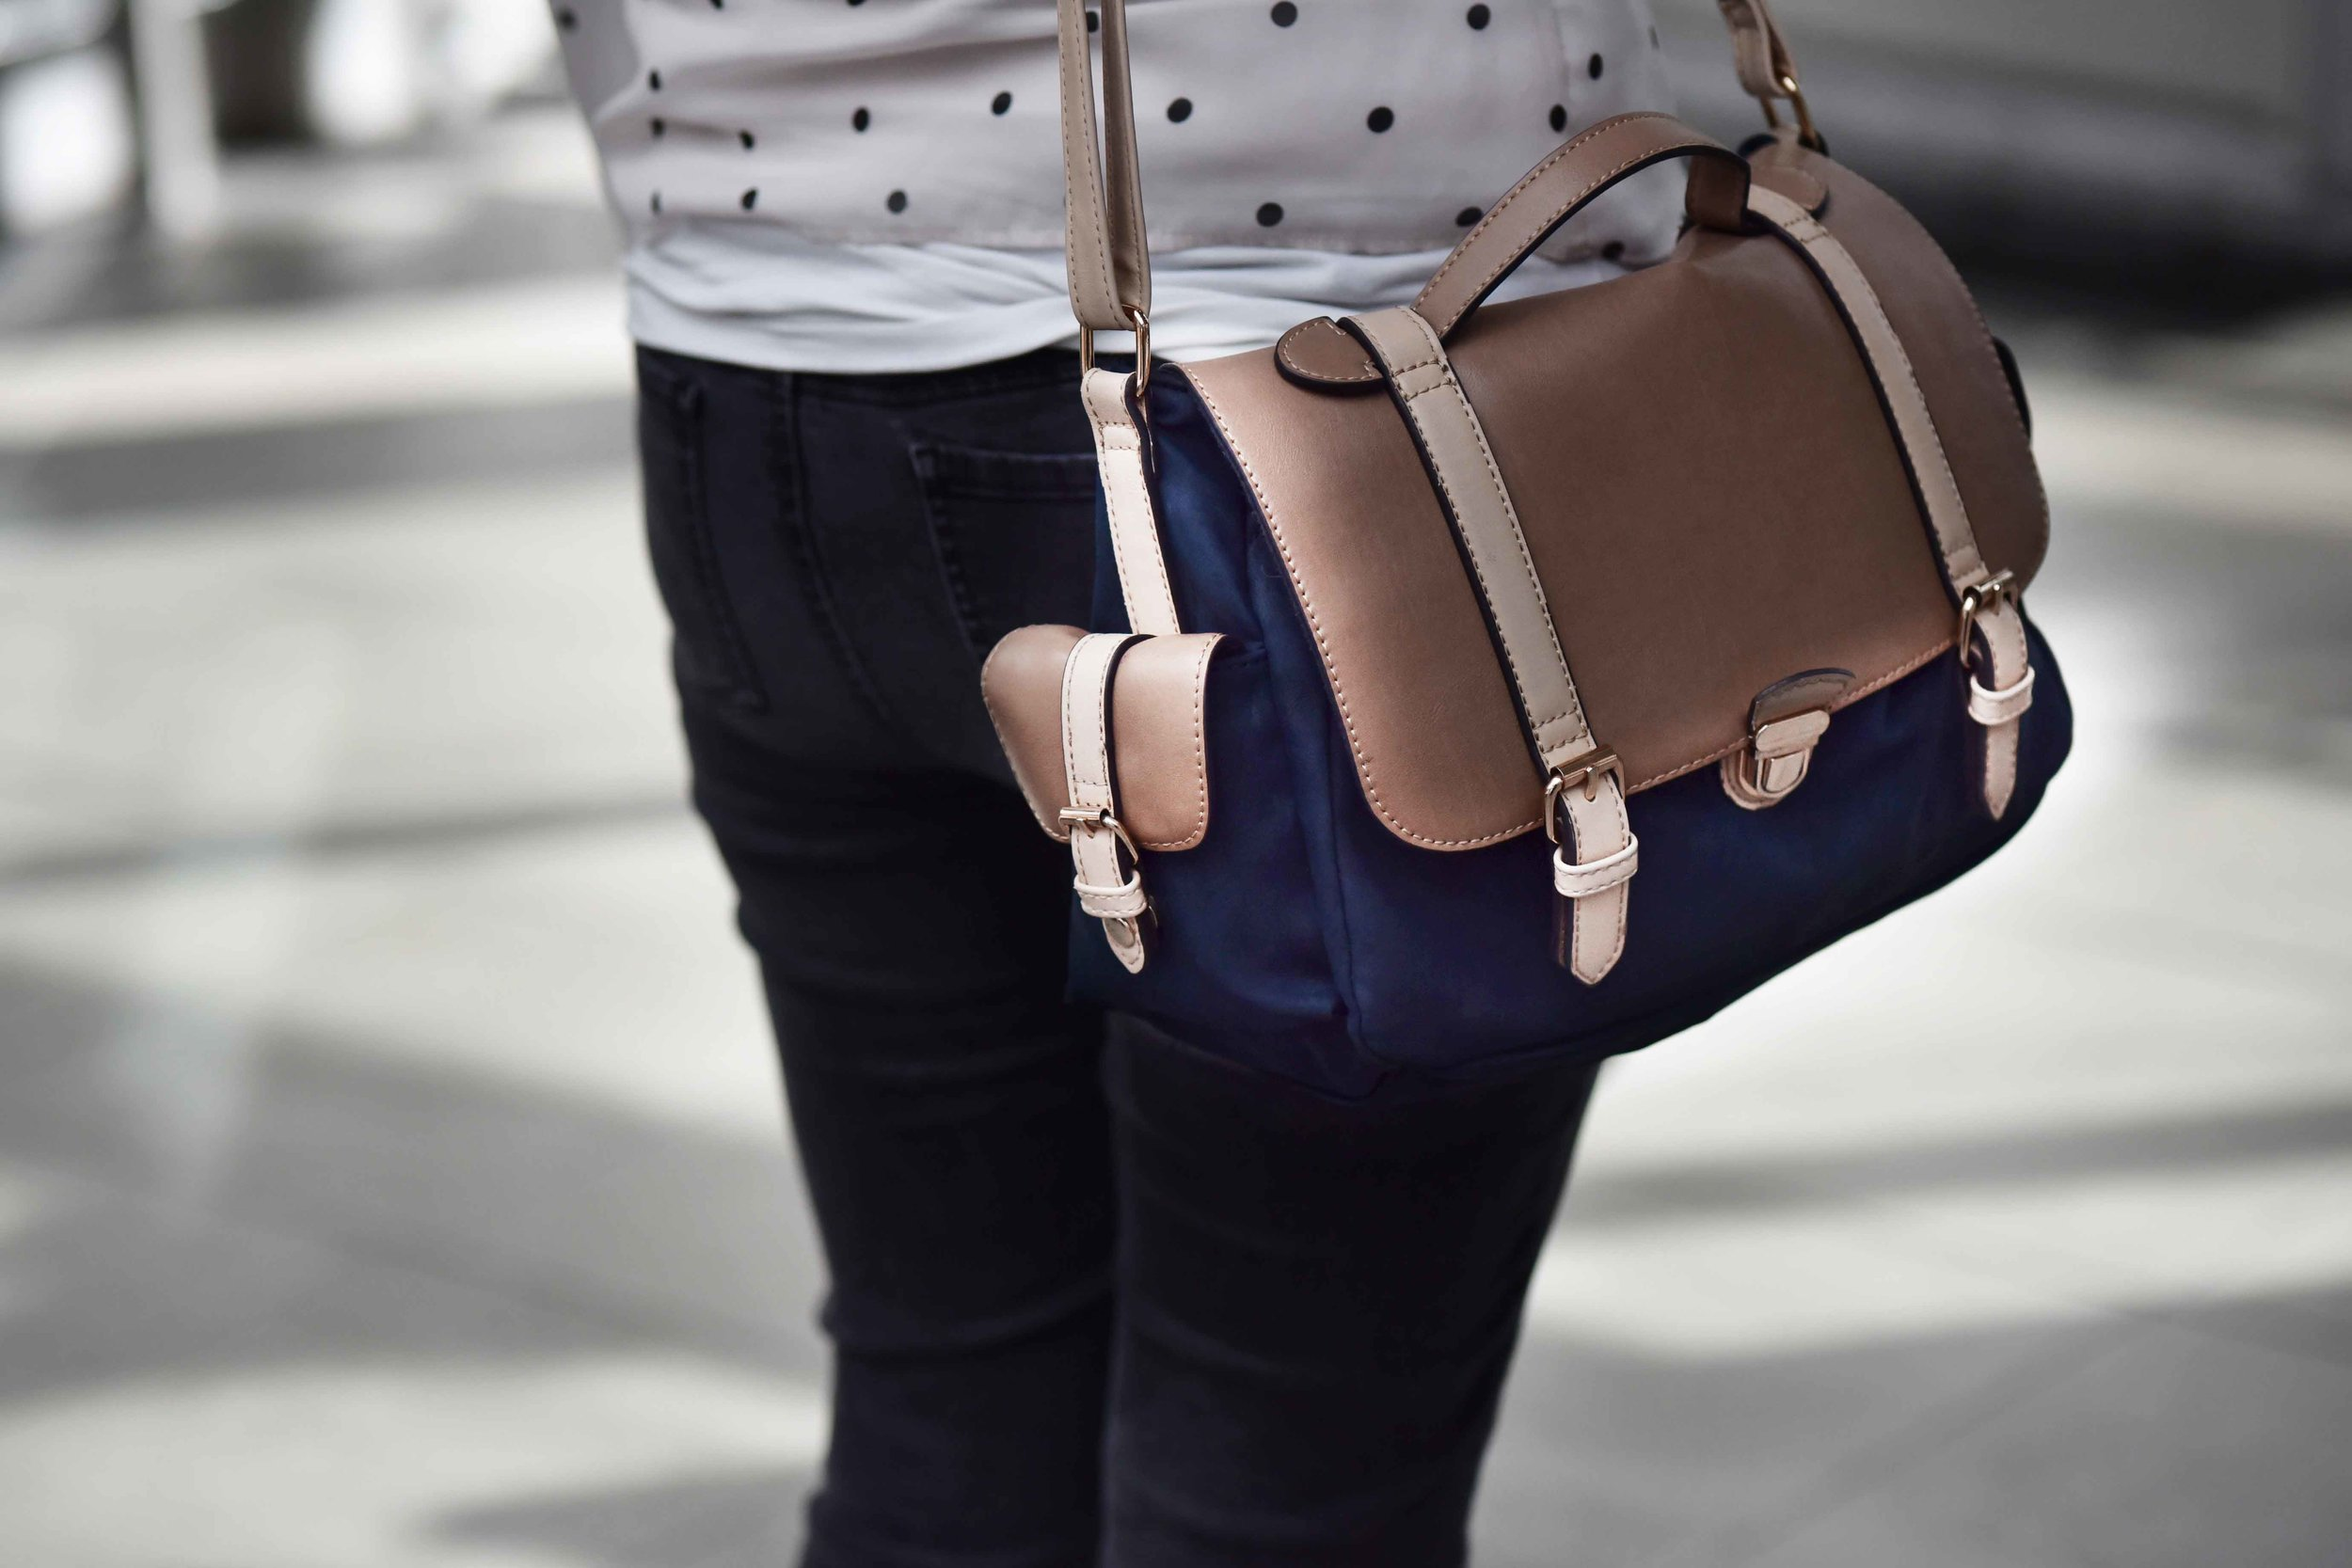 Street style travel bag, Edinburgh Waverley, image©sourcingstyle.com